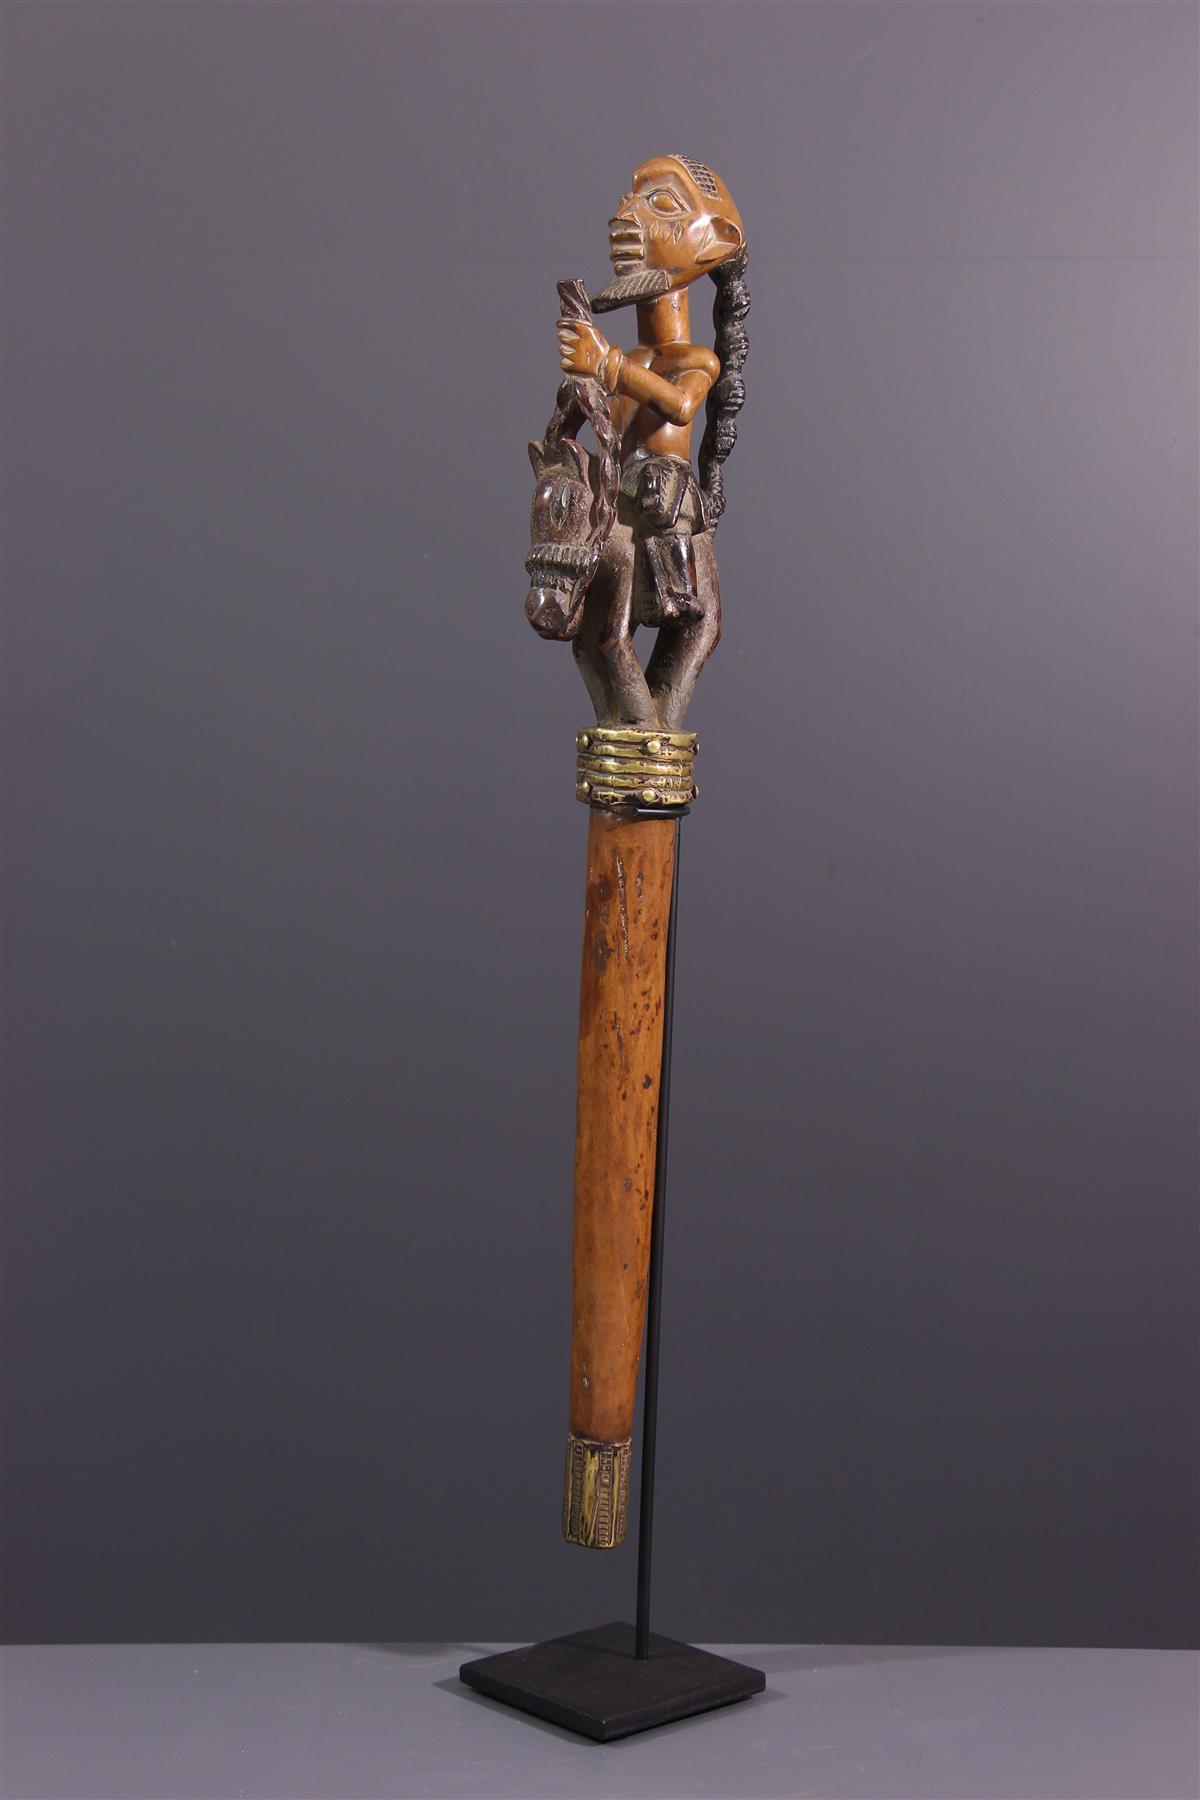 Sceptre Yorouba - Art africain